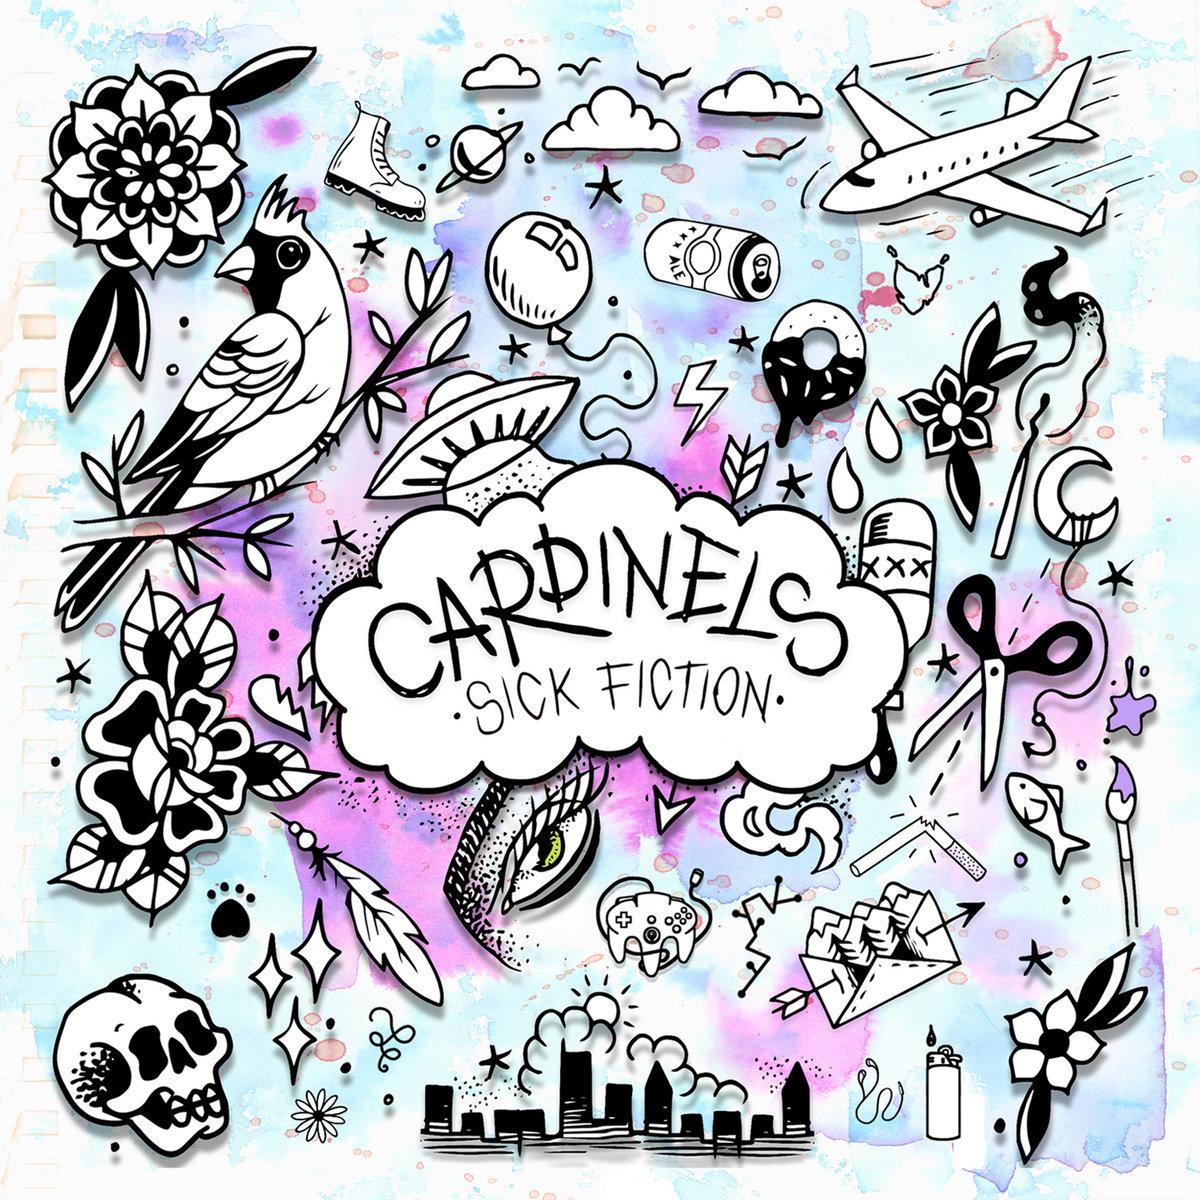 Cardinels